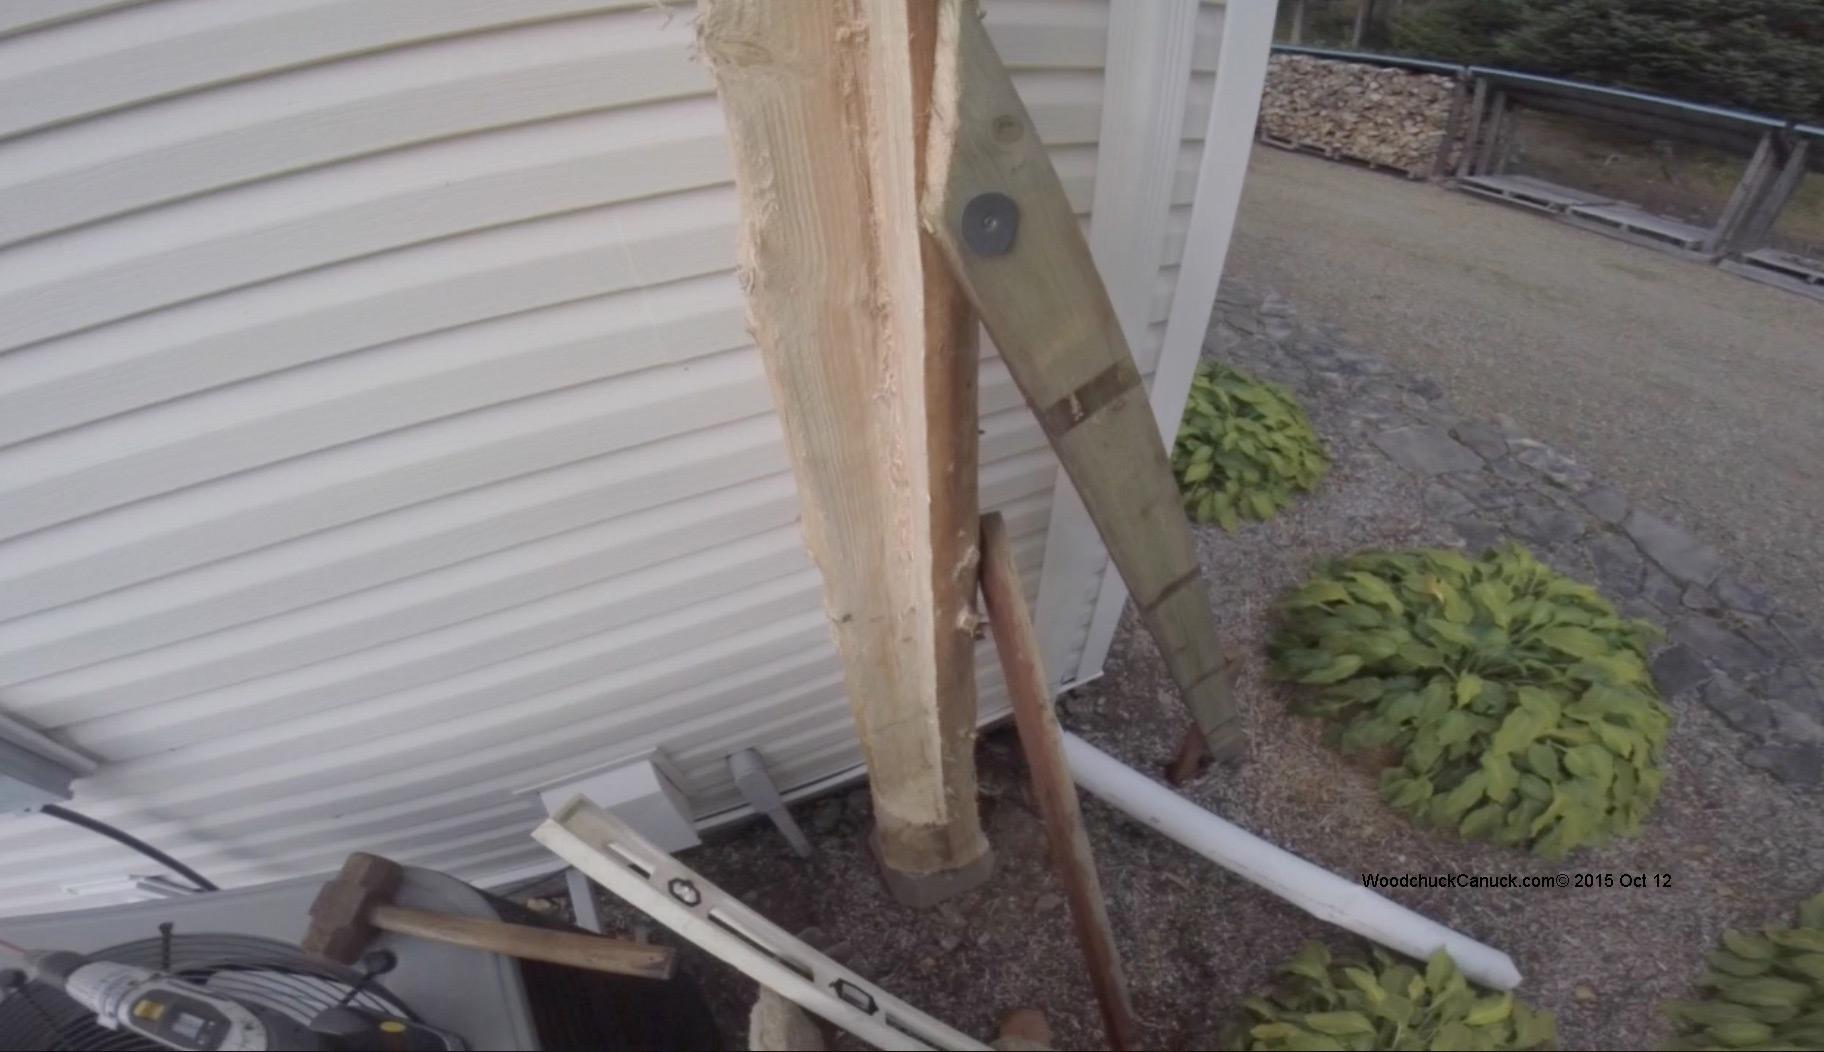 Heat Pump Shelters : Building a heat pump shelter